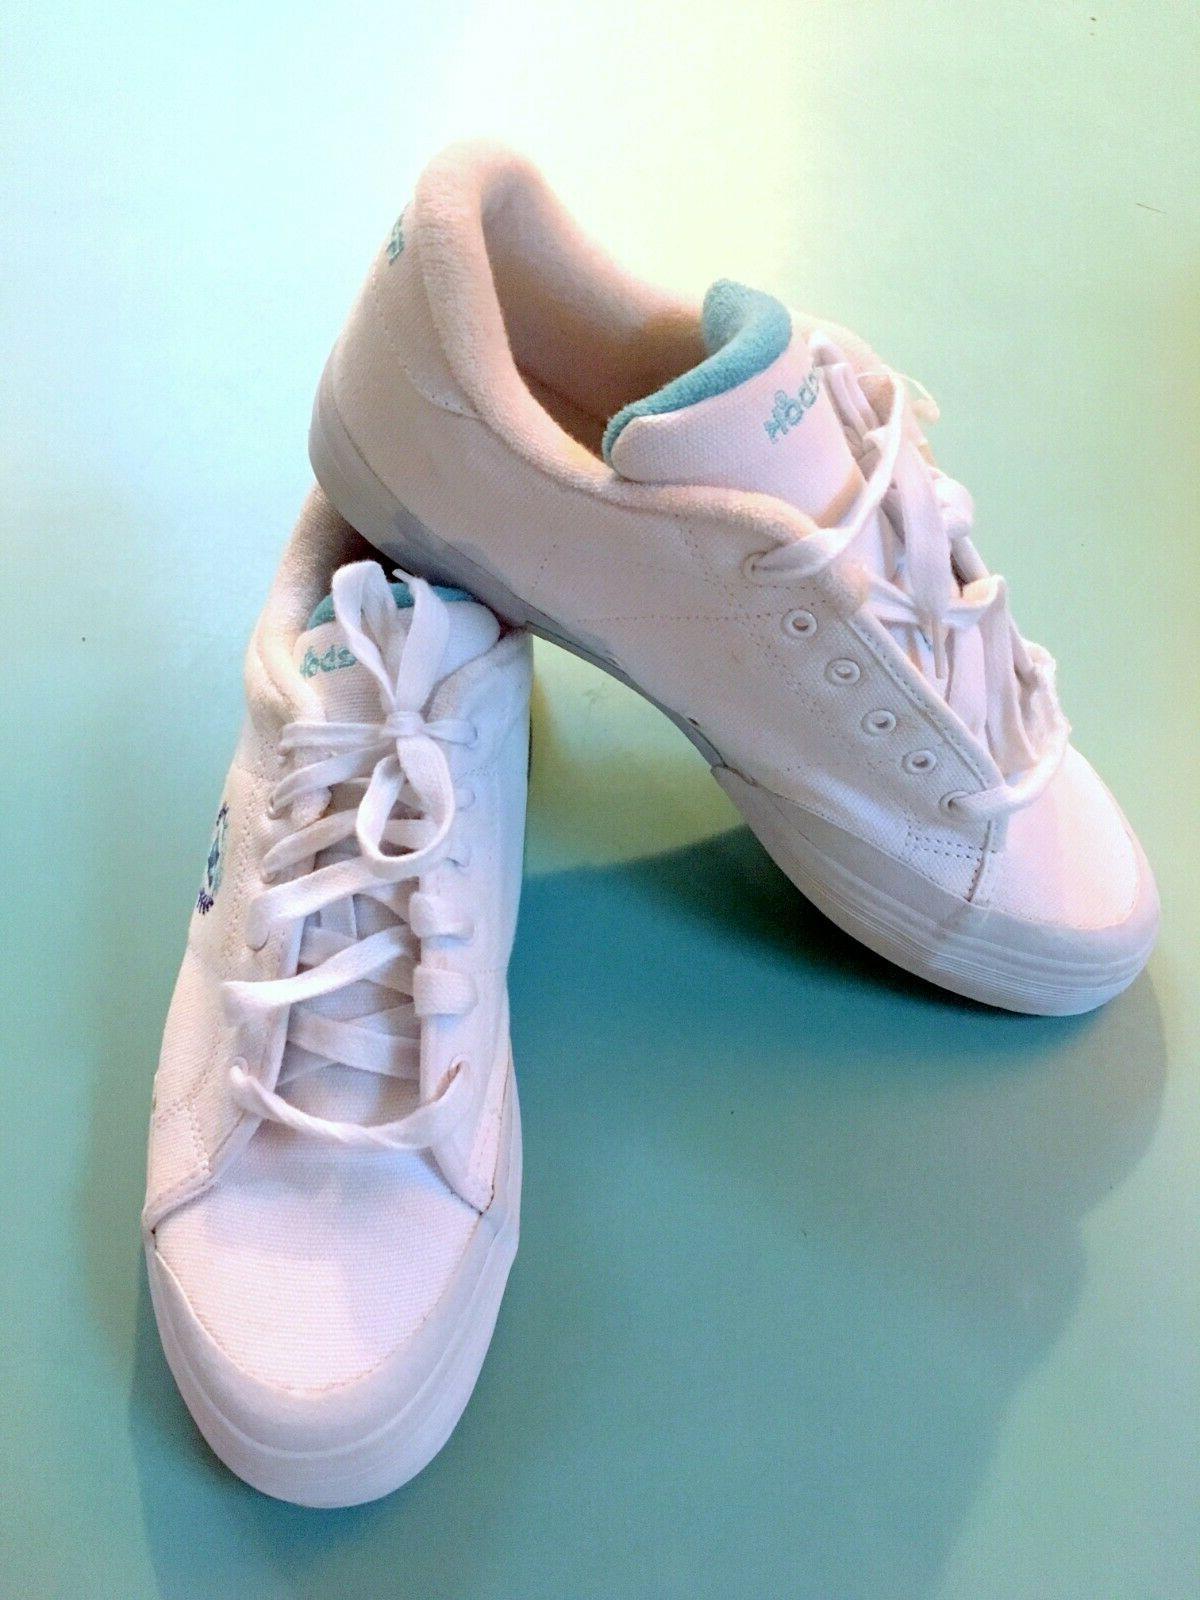 classic npc canvas insignia tennis athletic shoes